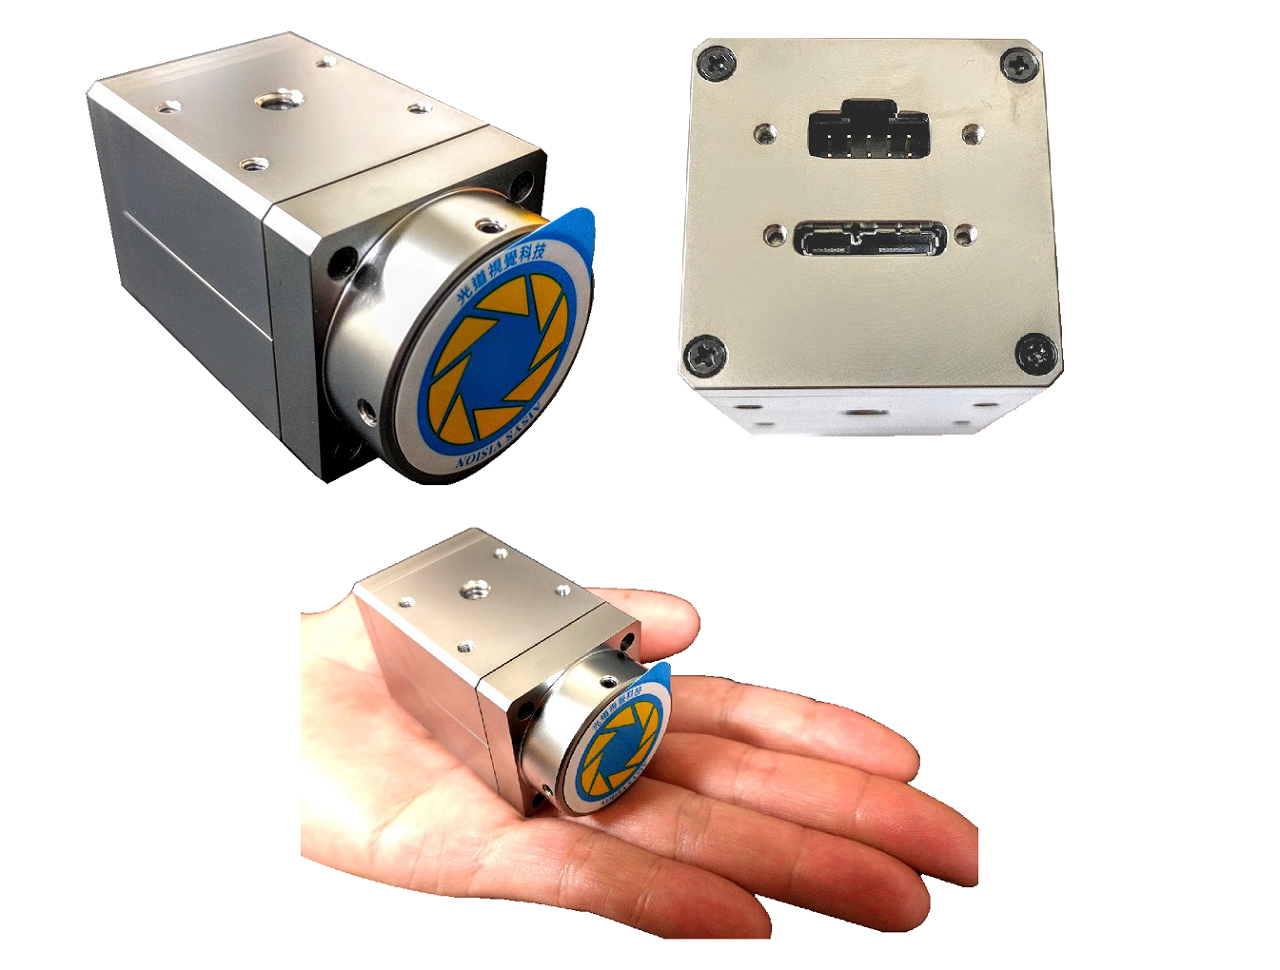 CYCLOPS SU30FC-860攝影機-300K像素、非同步式、彩色、內建LED燈源控制器